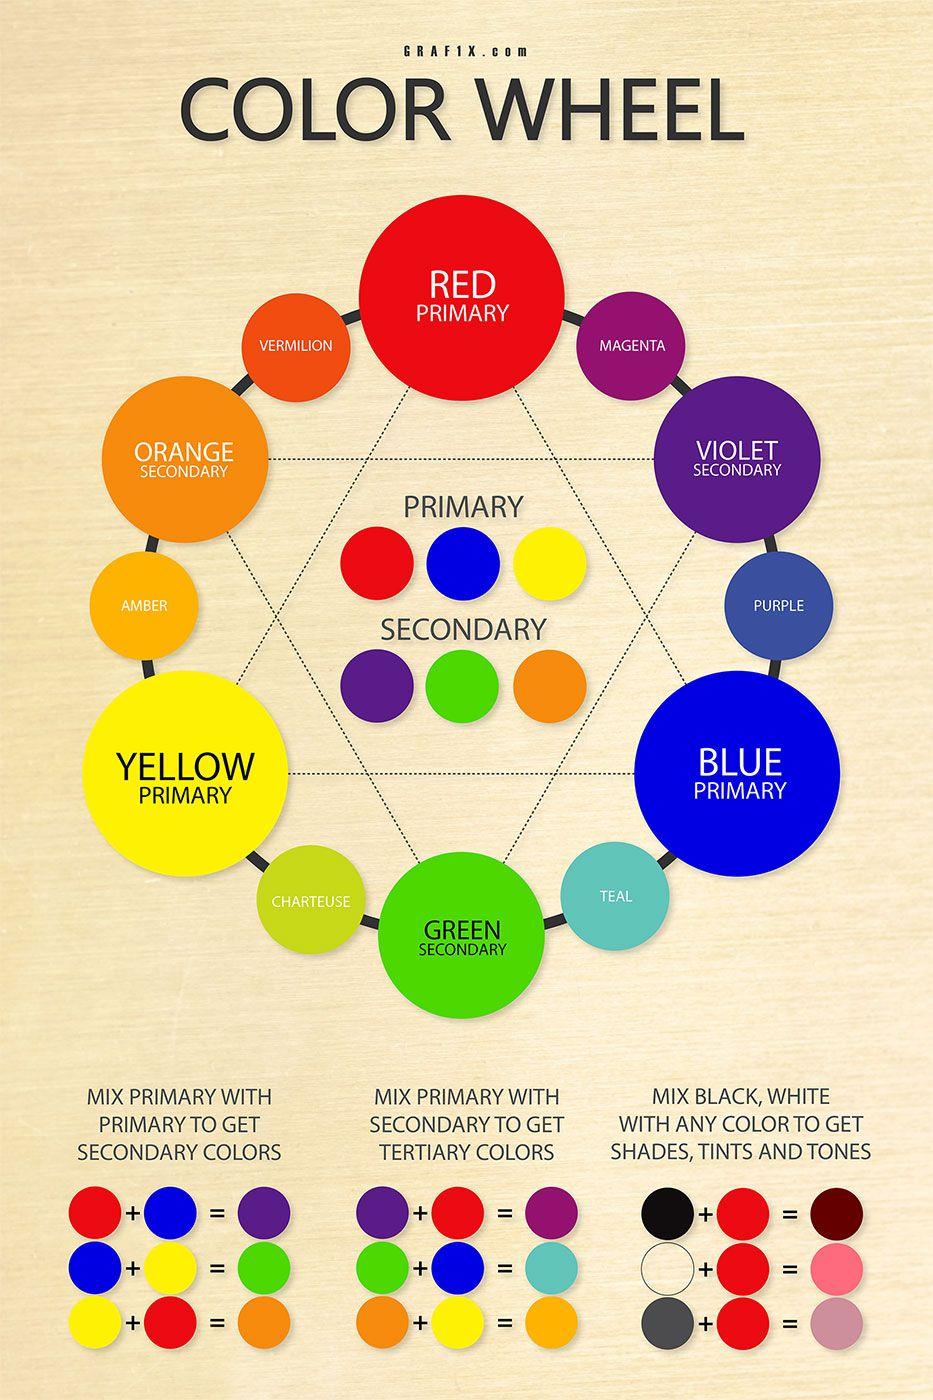 Color Mixing Guide Poster Graf1x Com Color Mixing Chart Color Wheel Art Color Mixing Guide